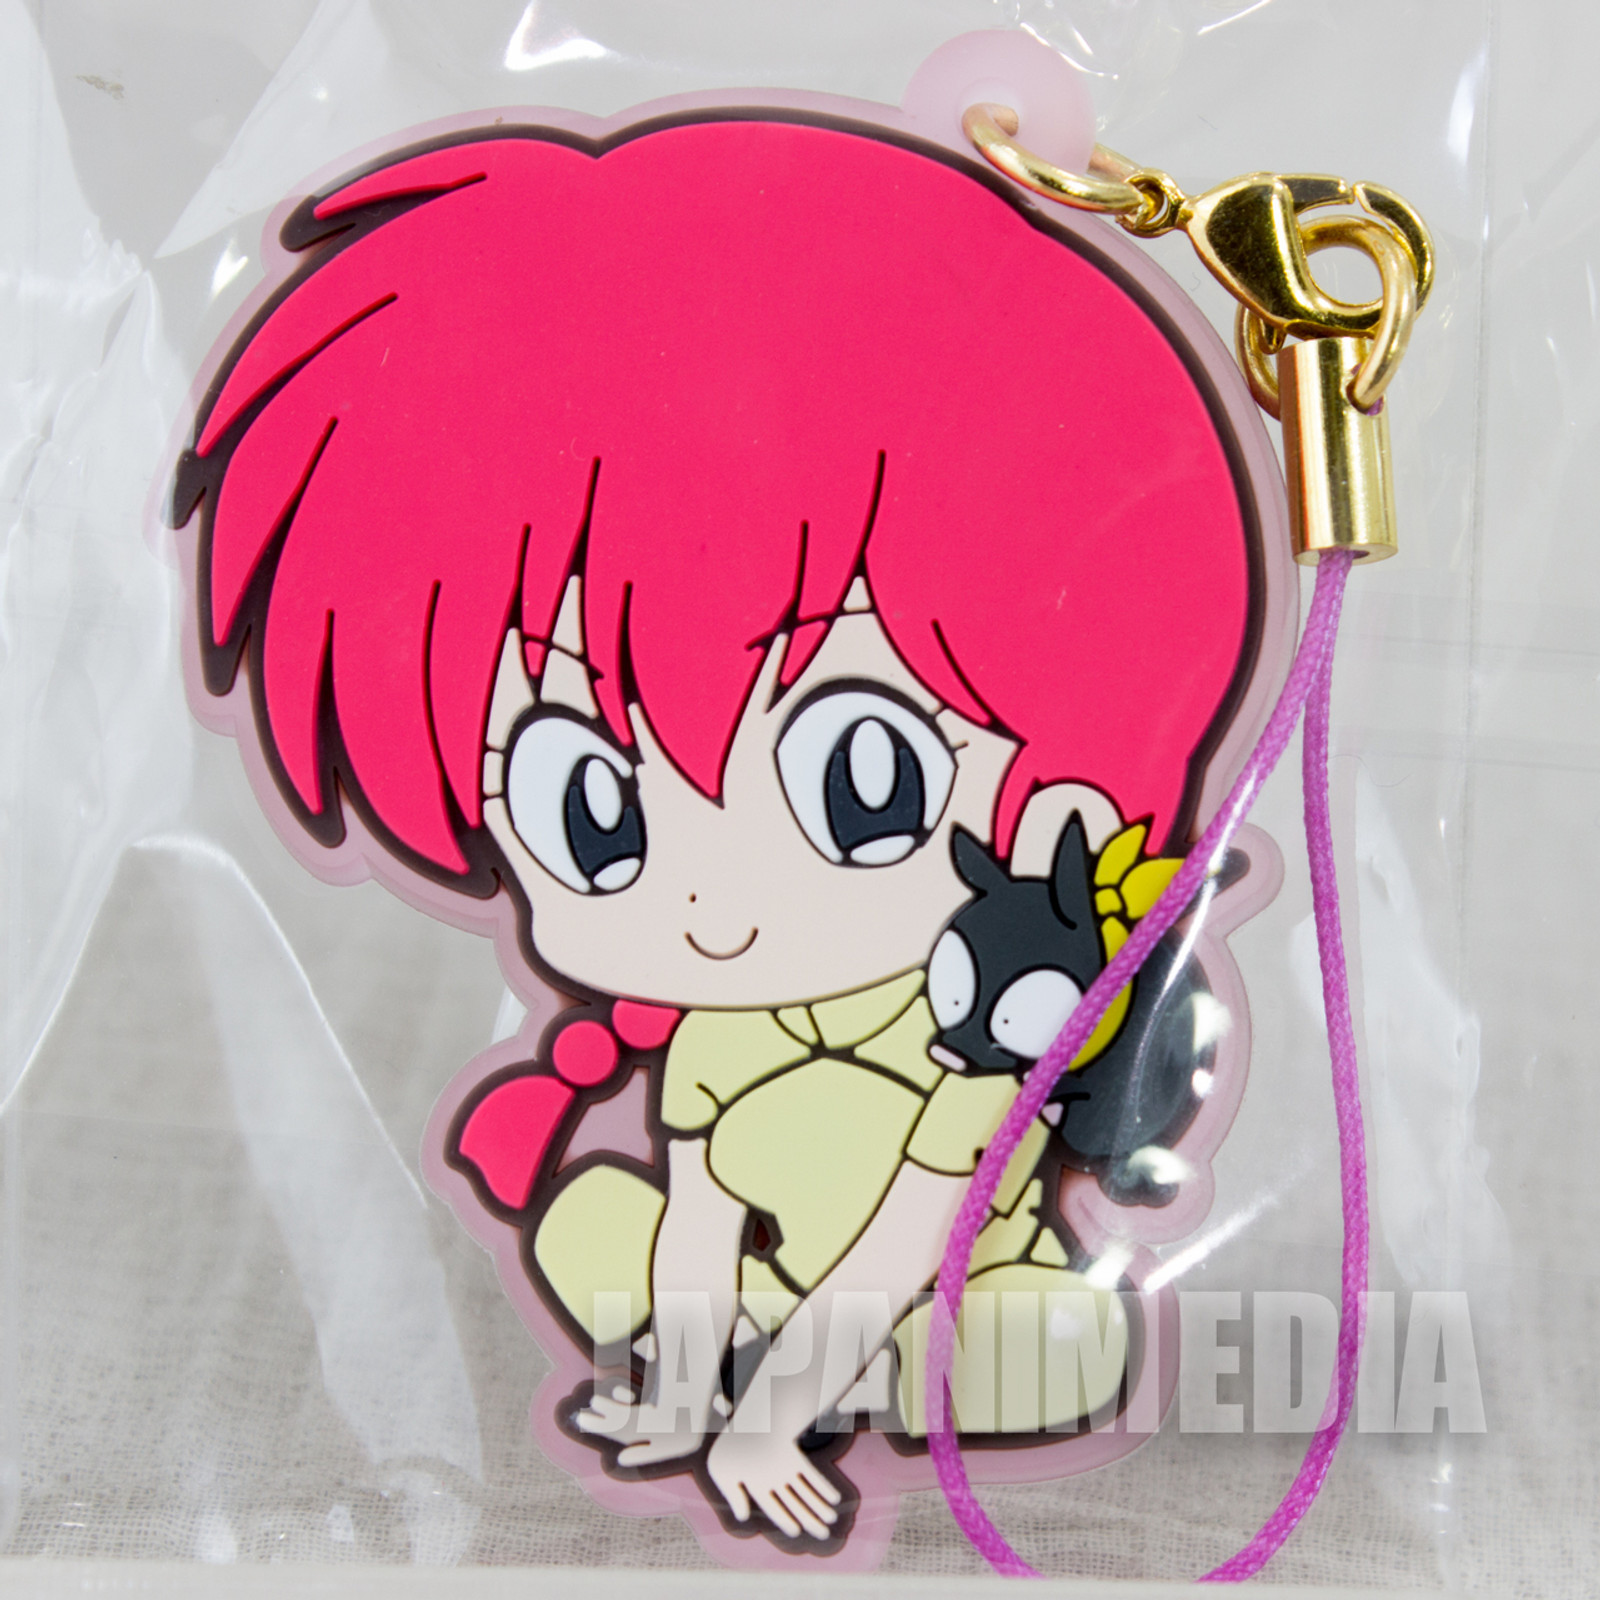 Ranma 1/2 Saotome Ranma Rubber Mascot Key Chain JAPAN ANIME RUMIKO TAKAHASHI